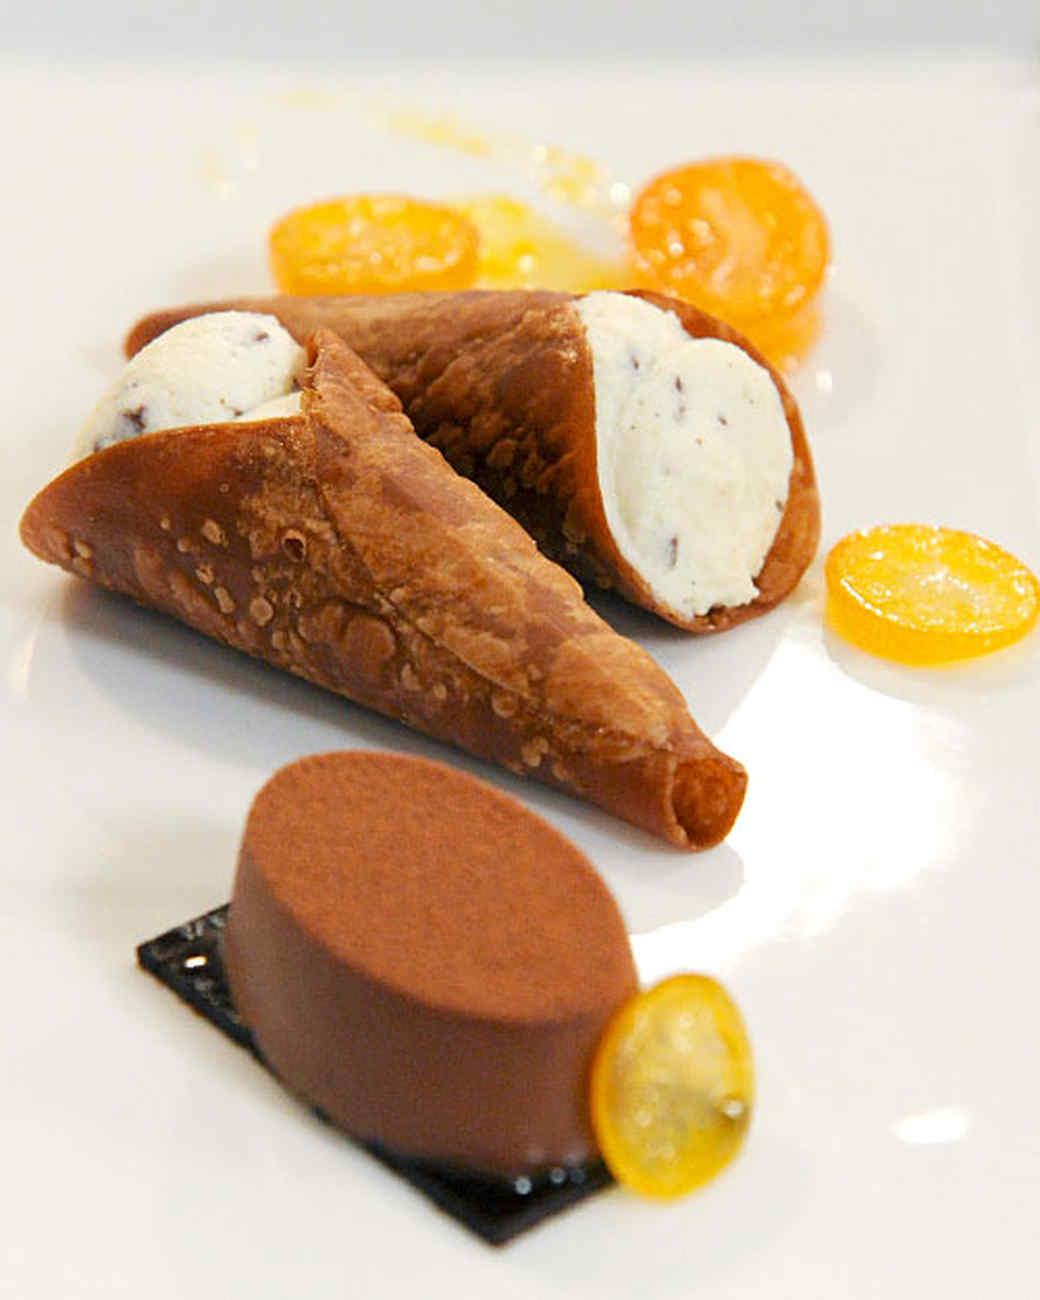 Ricotta-Filled Chocolate Cannoli